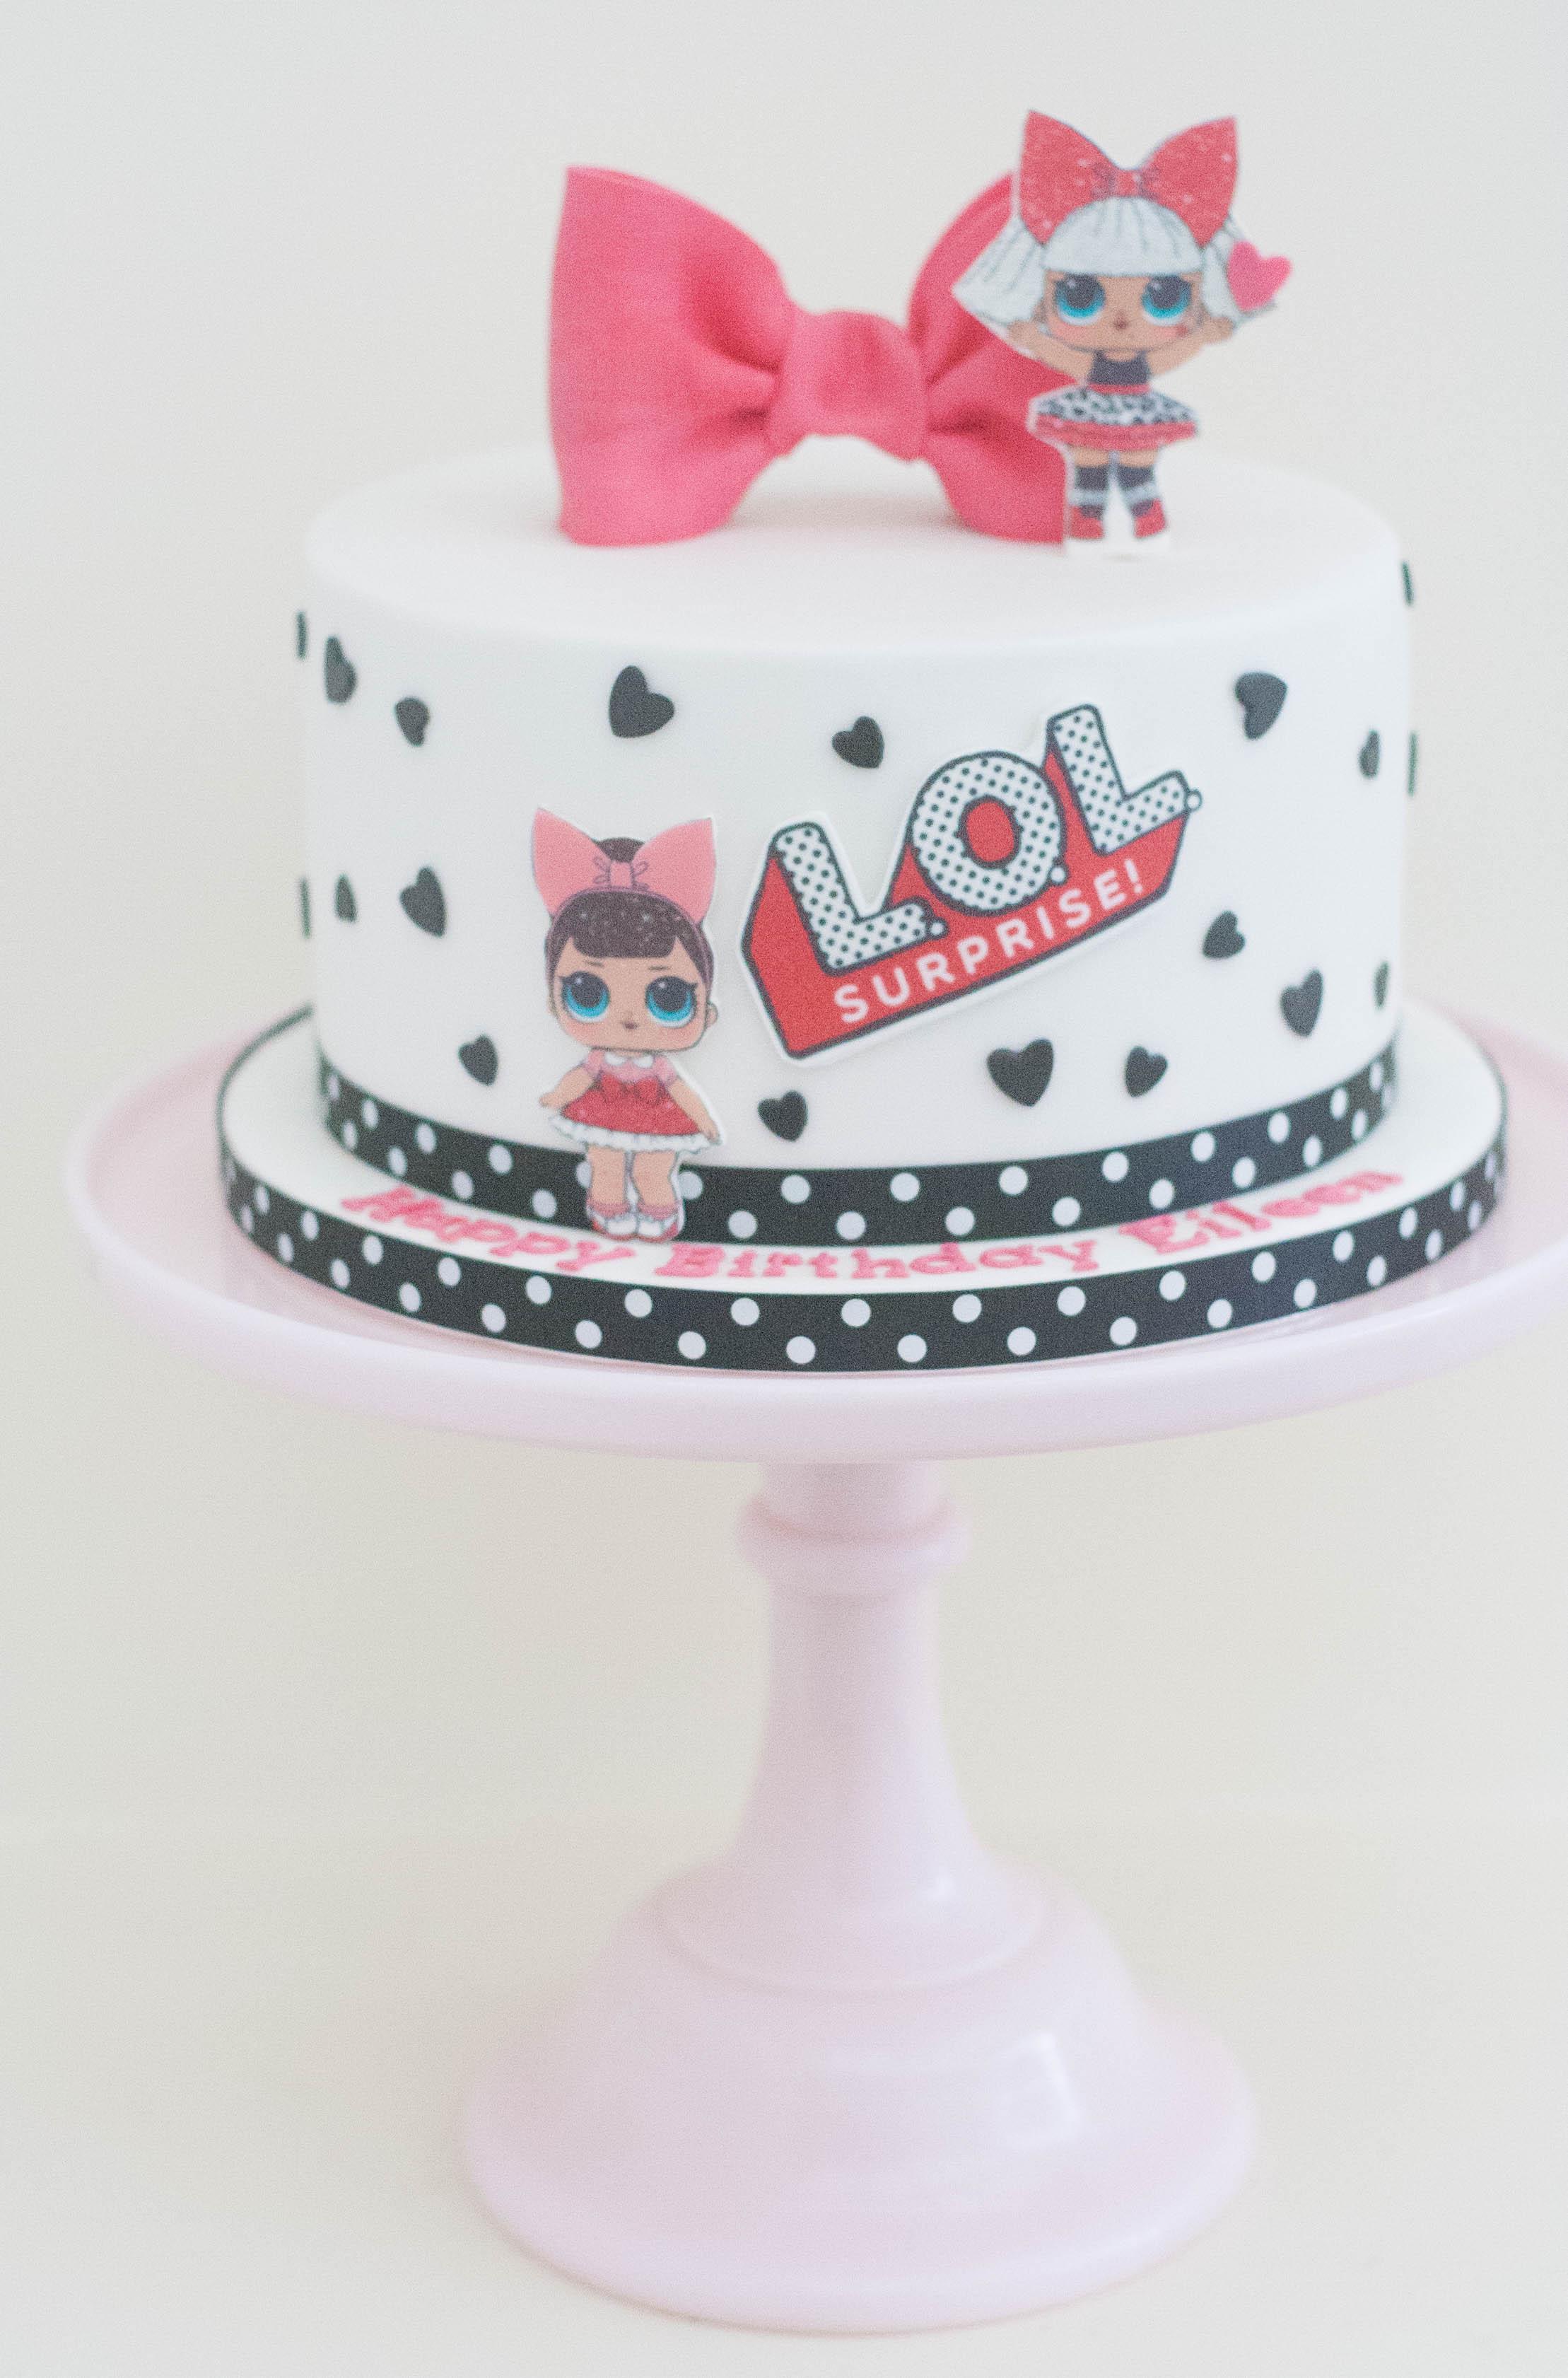 LOL doll vegan cake